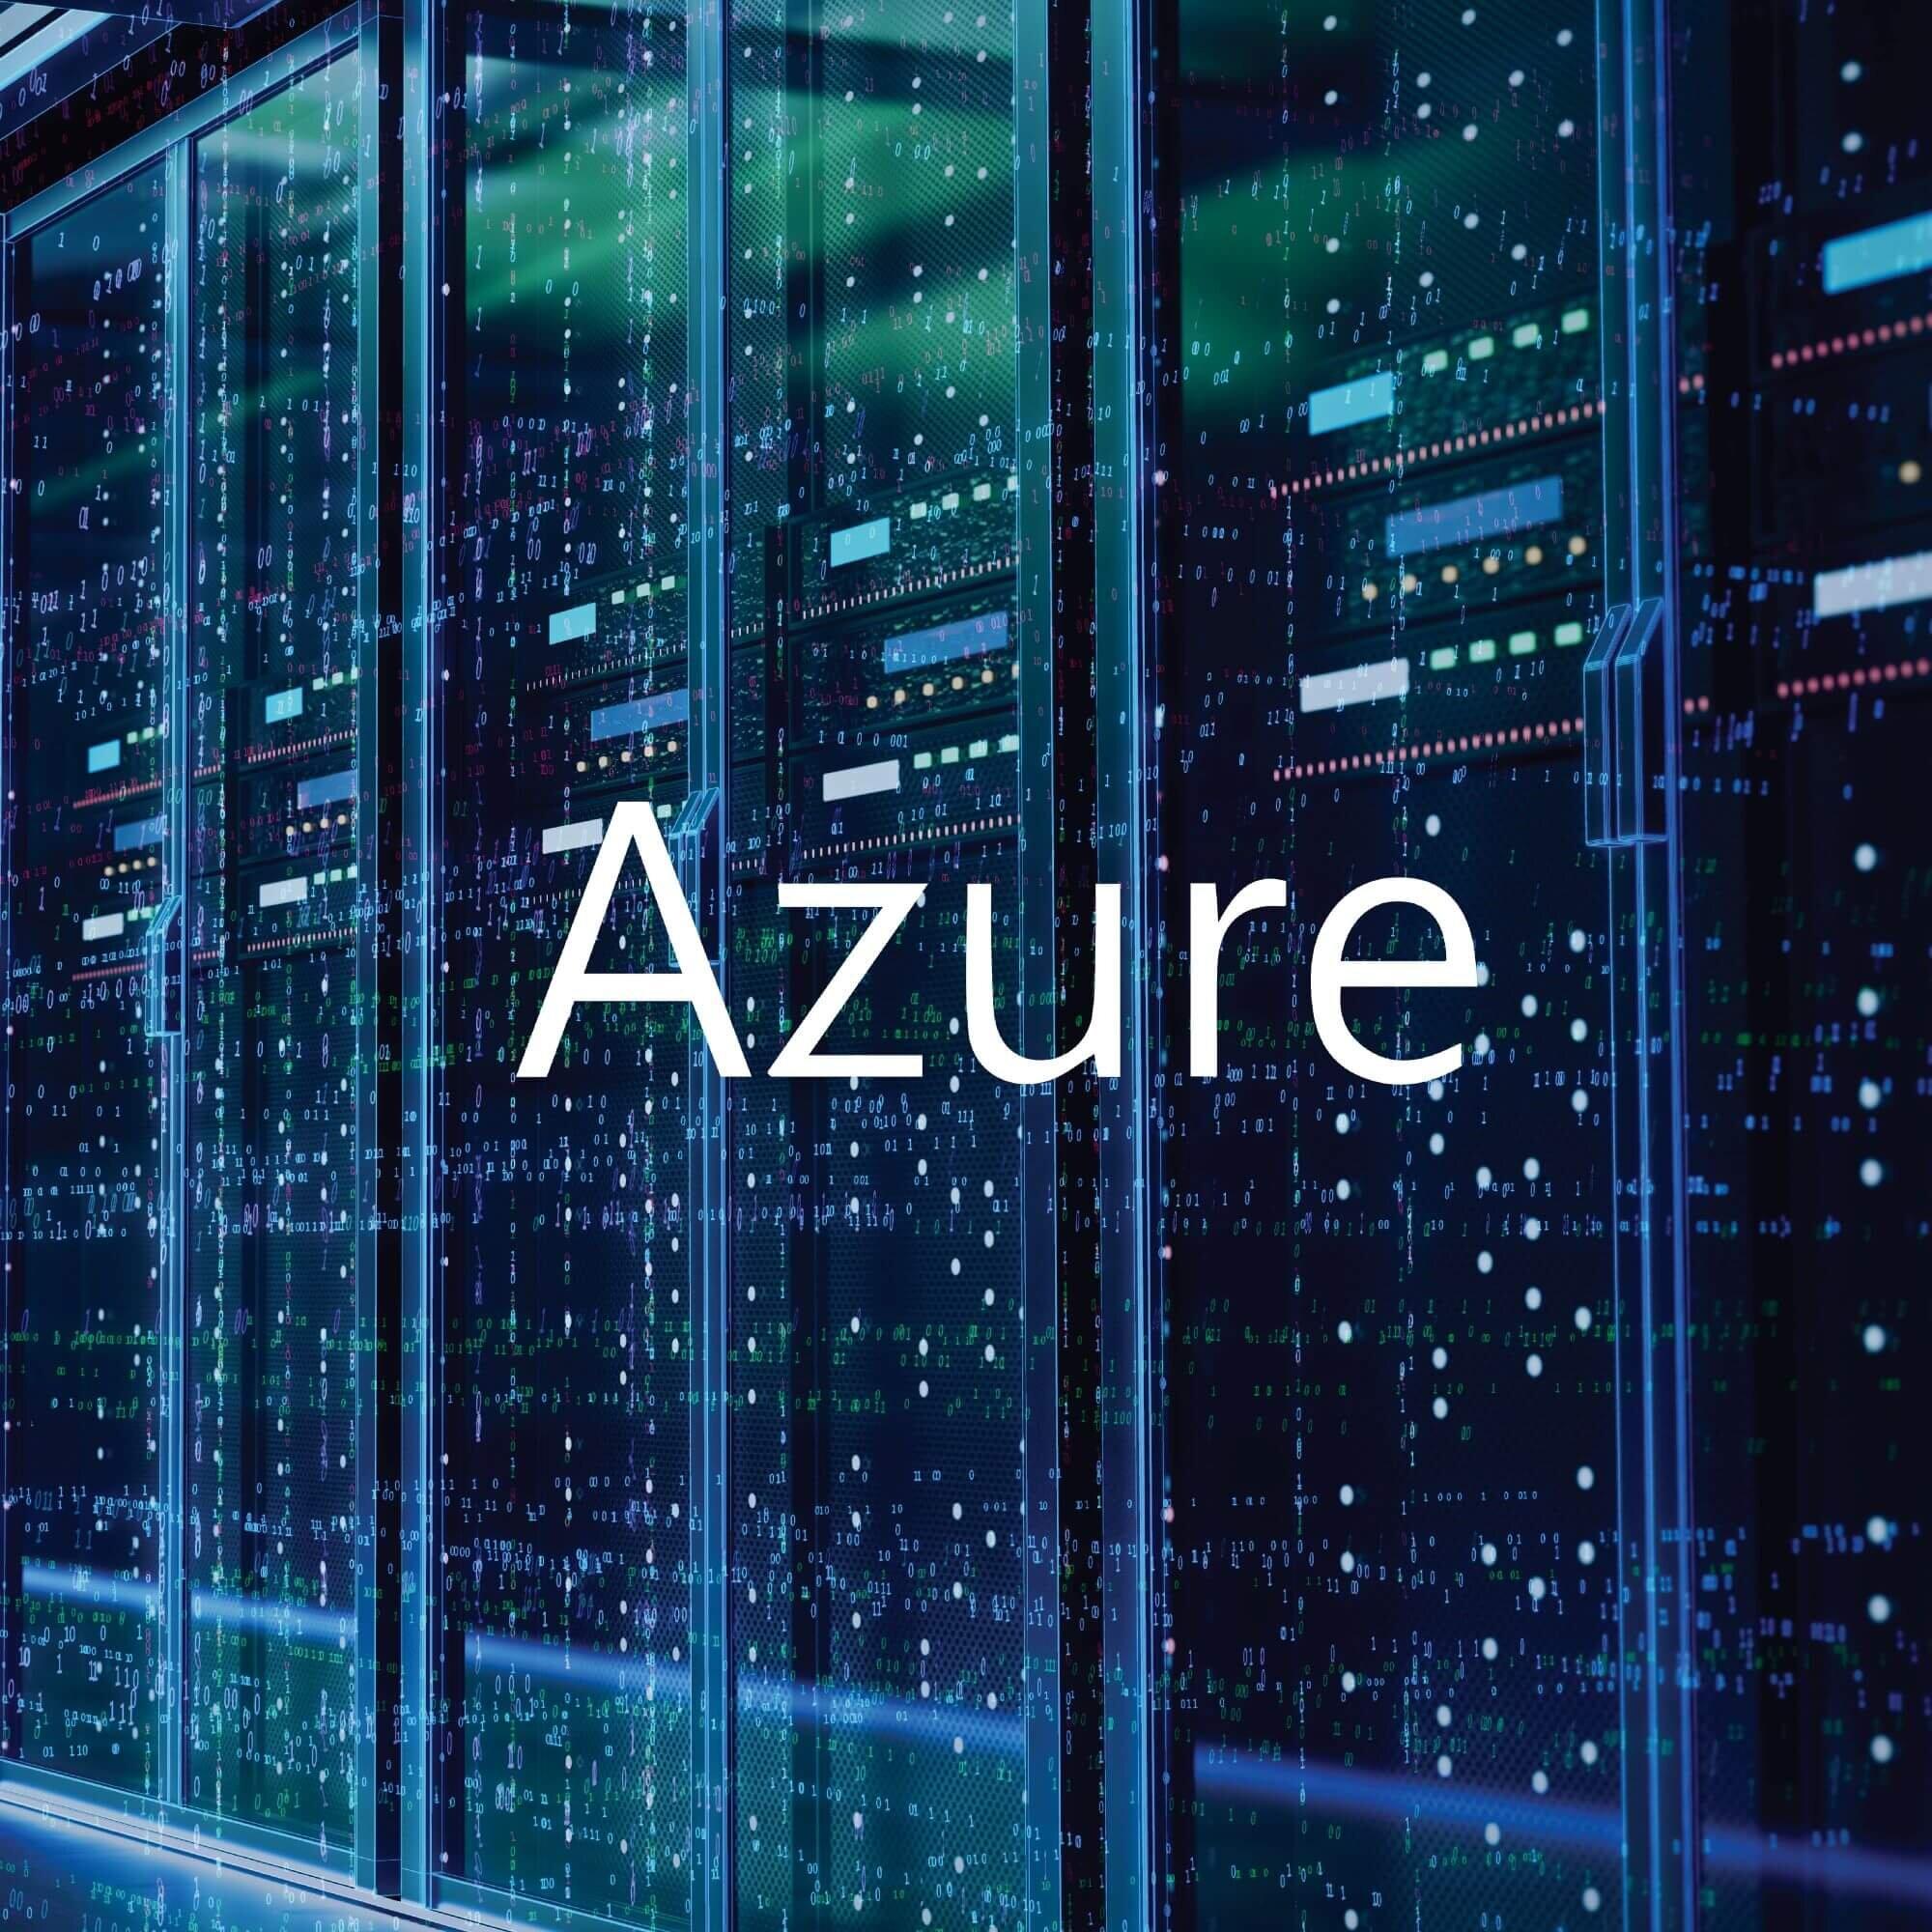 Azure_Microsoft_credential.jpg